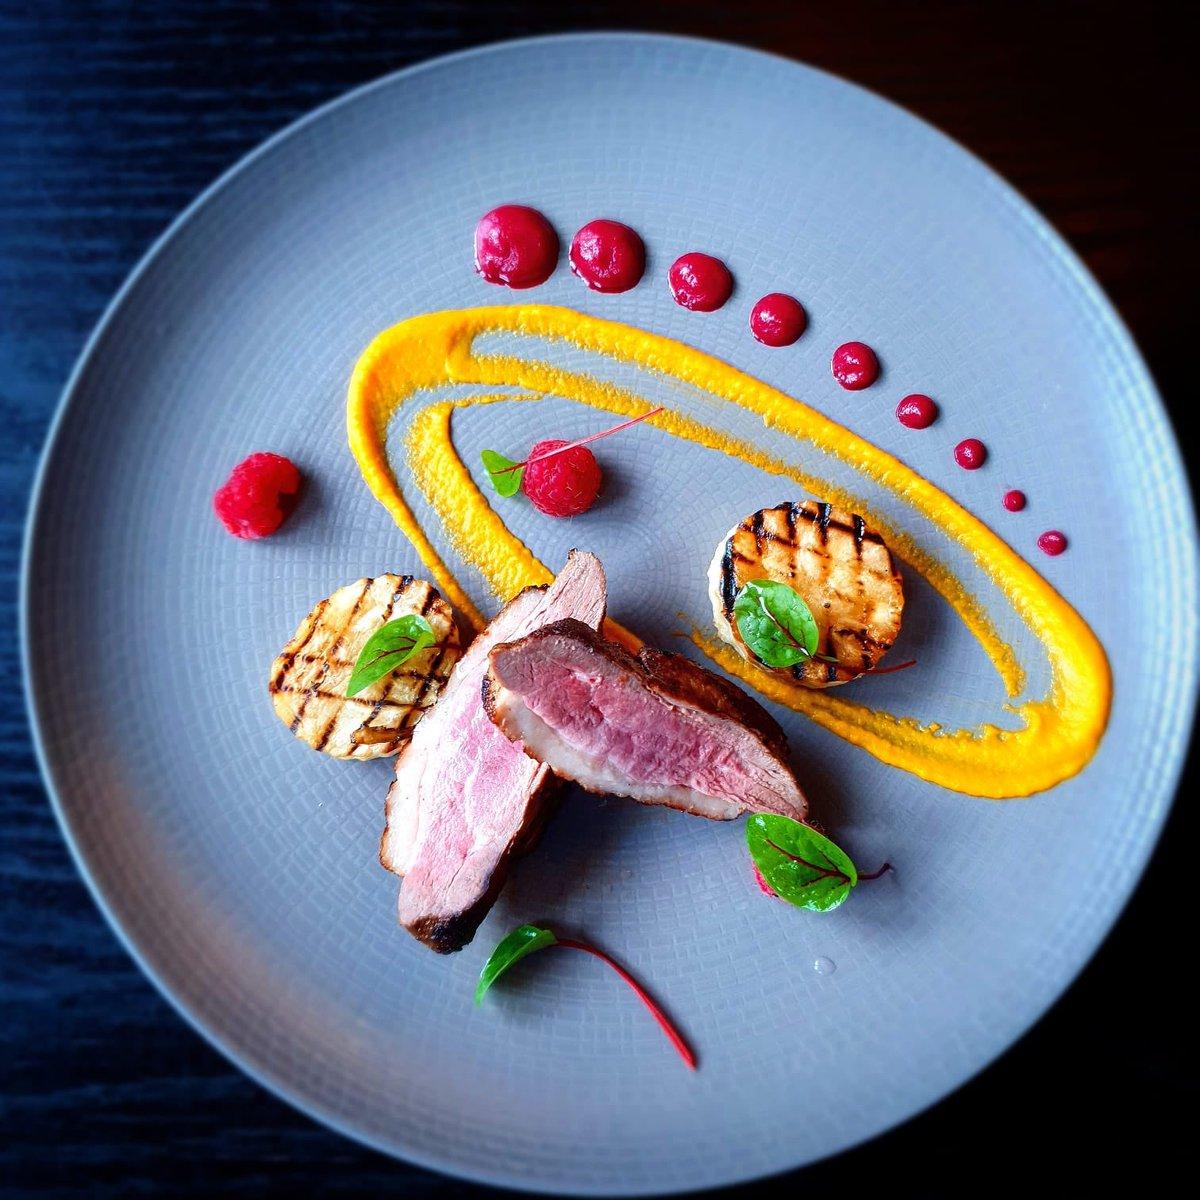 Today's special. Panfried duck breast, beetroot carrot ginger and celeriac.  👨🍳 👩🍳 #dublincitycentre #dublinonourdoorstep #Ourteam #chefgoals #chefteam #dublinfood #dublindining https://t.co/ELF4ecnz3f